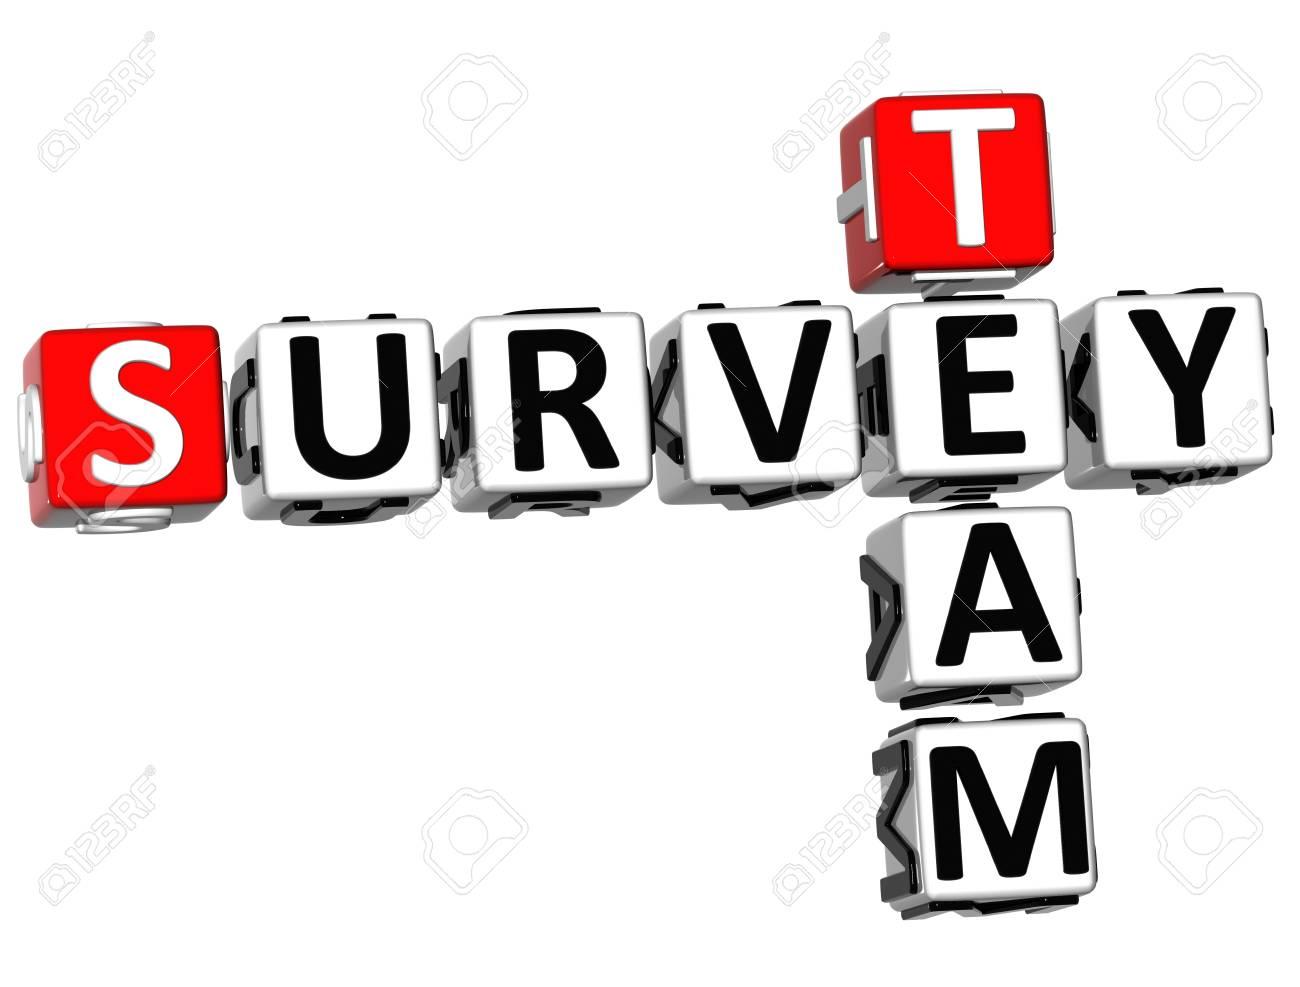 Errors team survey